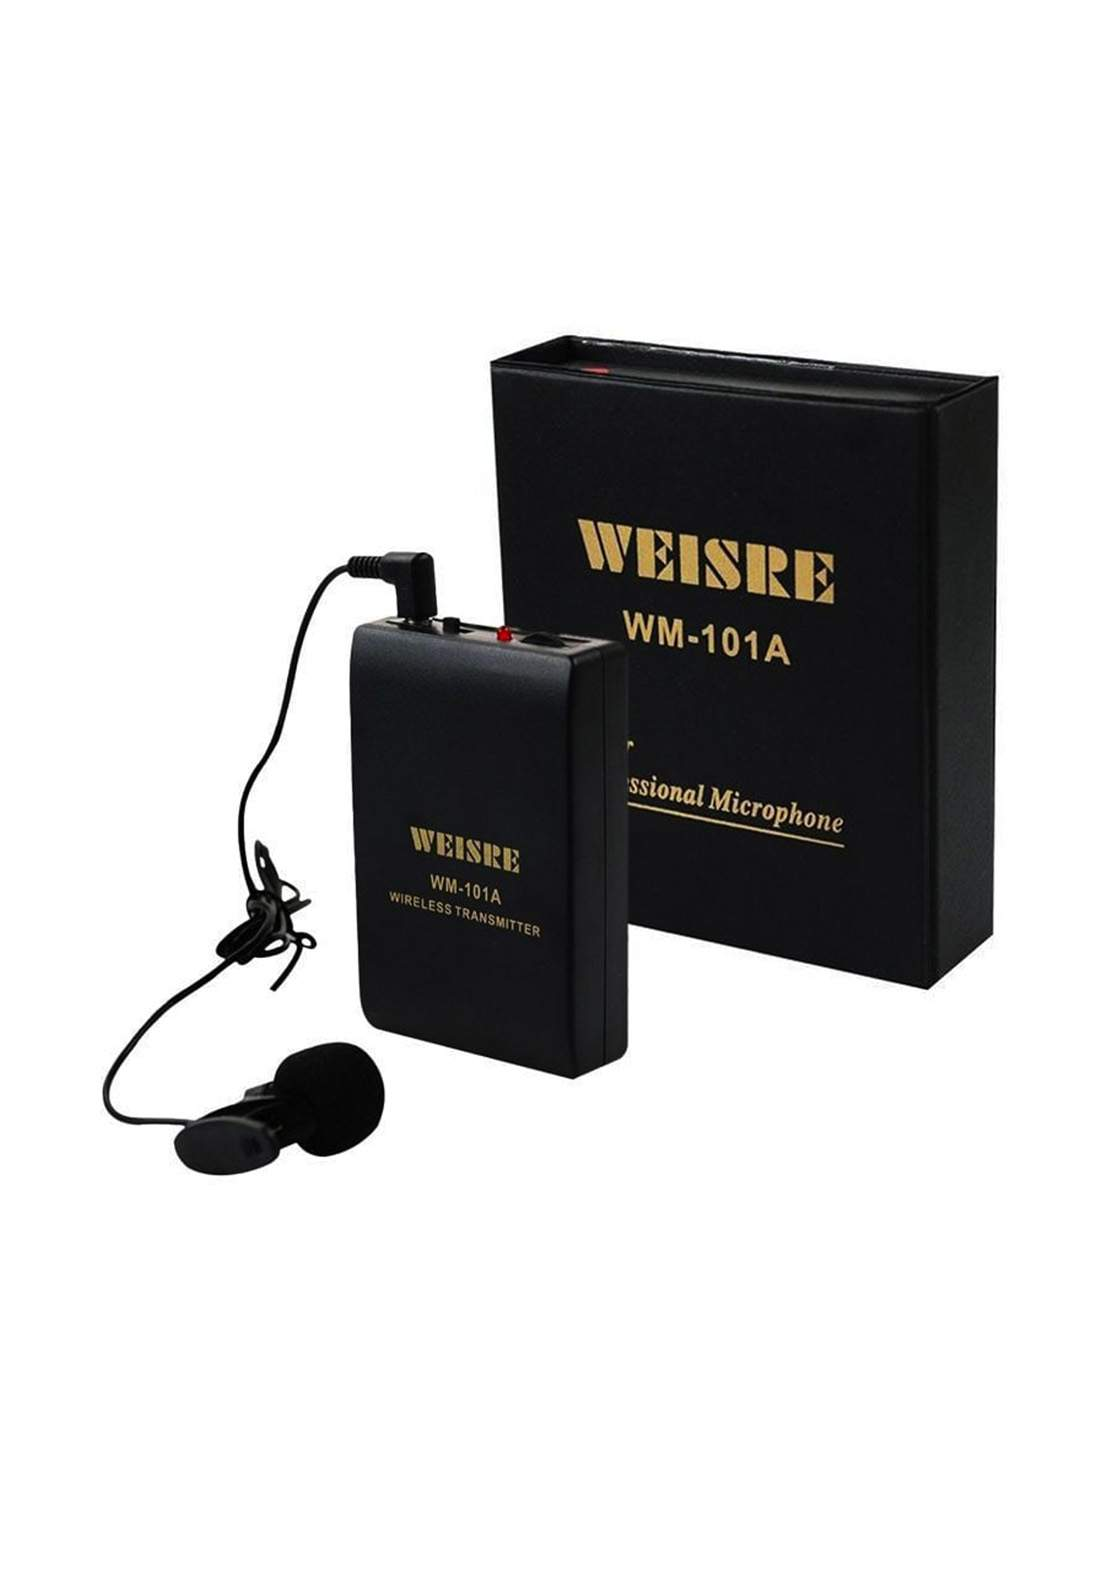 Weisre Wm-101A Professional Wireless Lavalier Microphone-Black مايكروفون